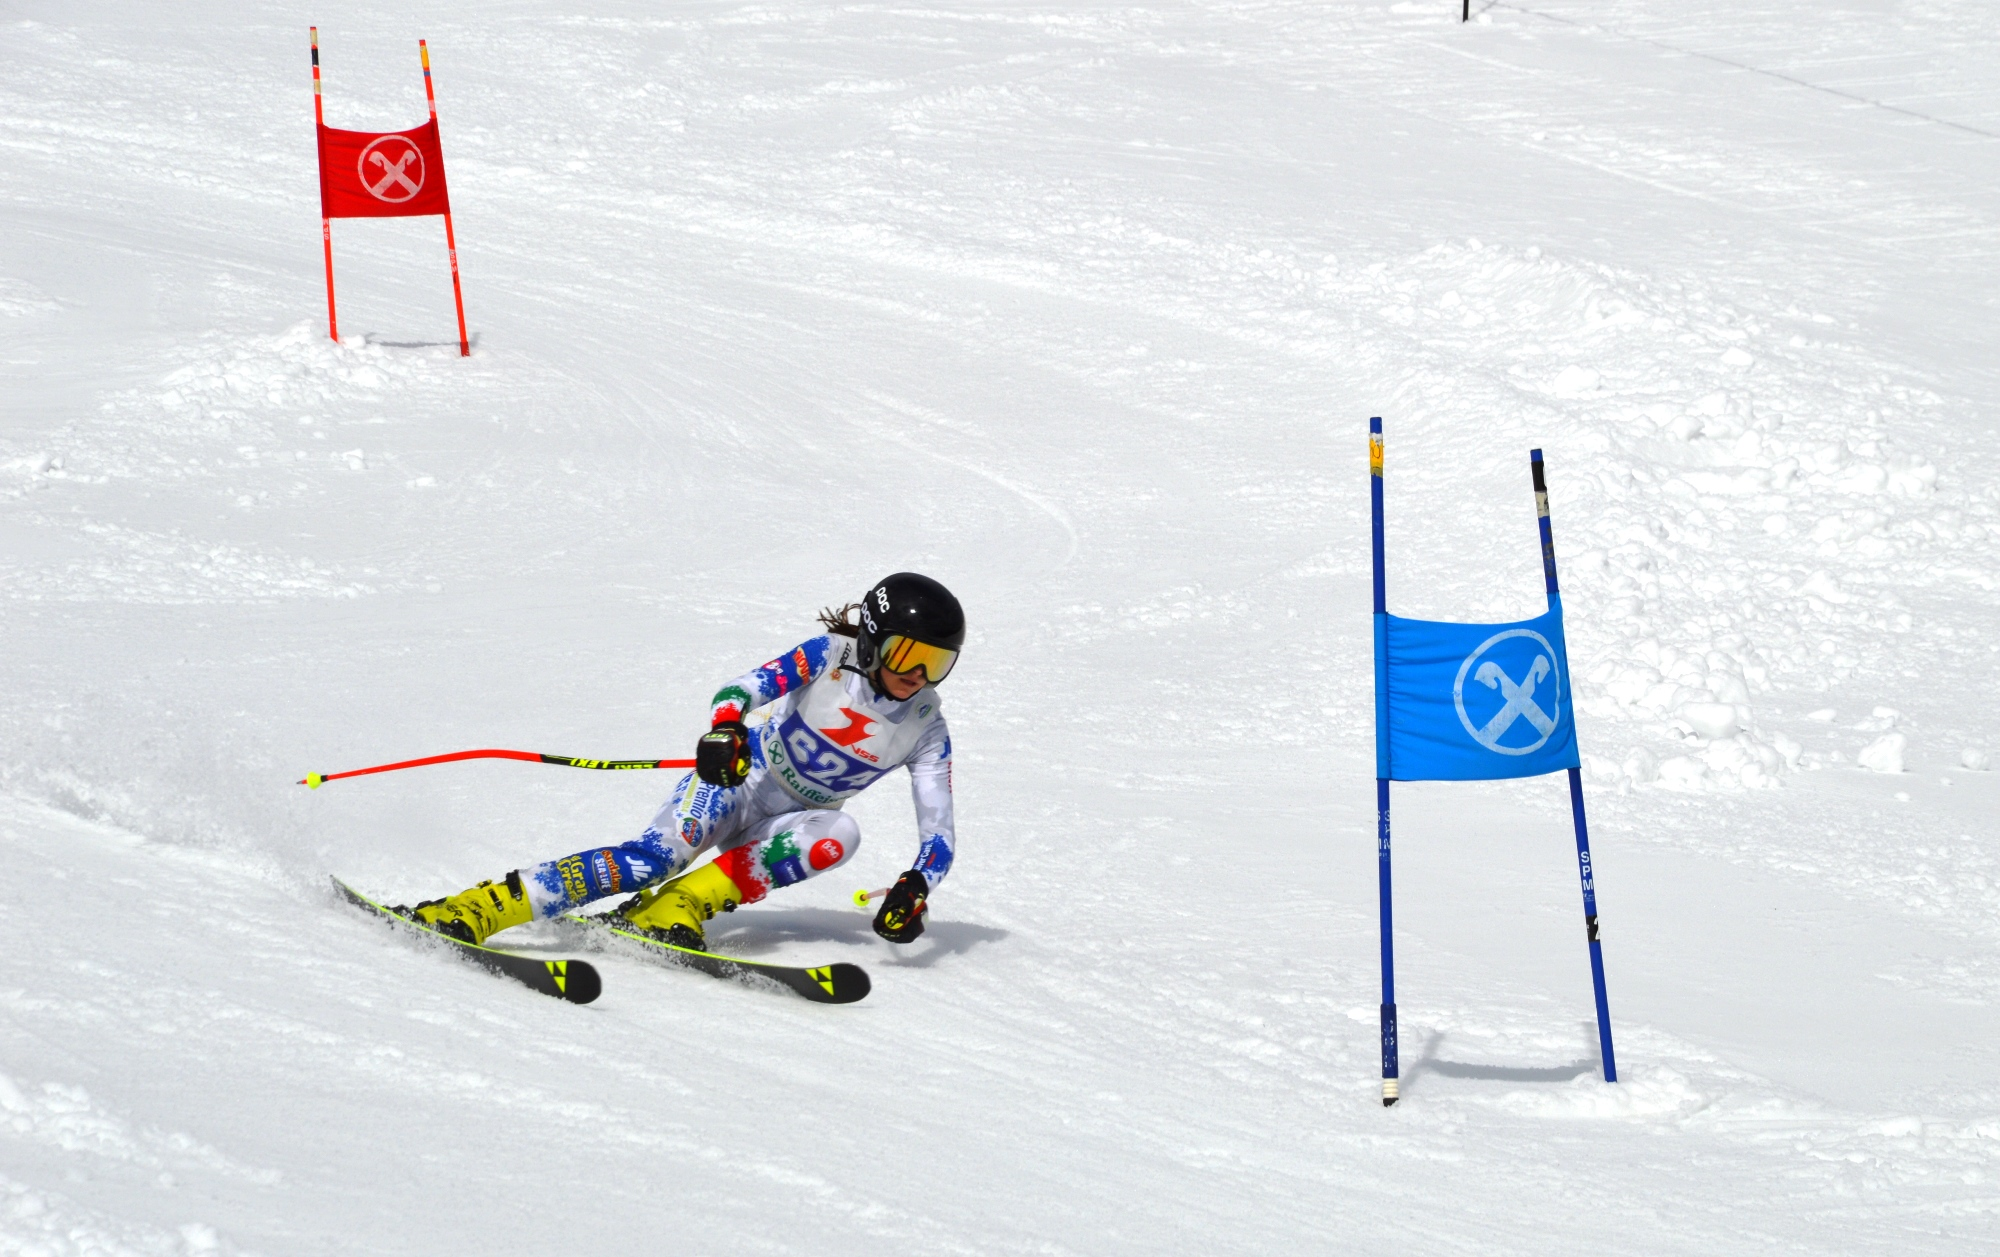 VSS/Raiffeisen Kinderski-Landesmeisterschaften 2017